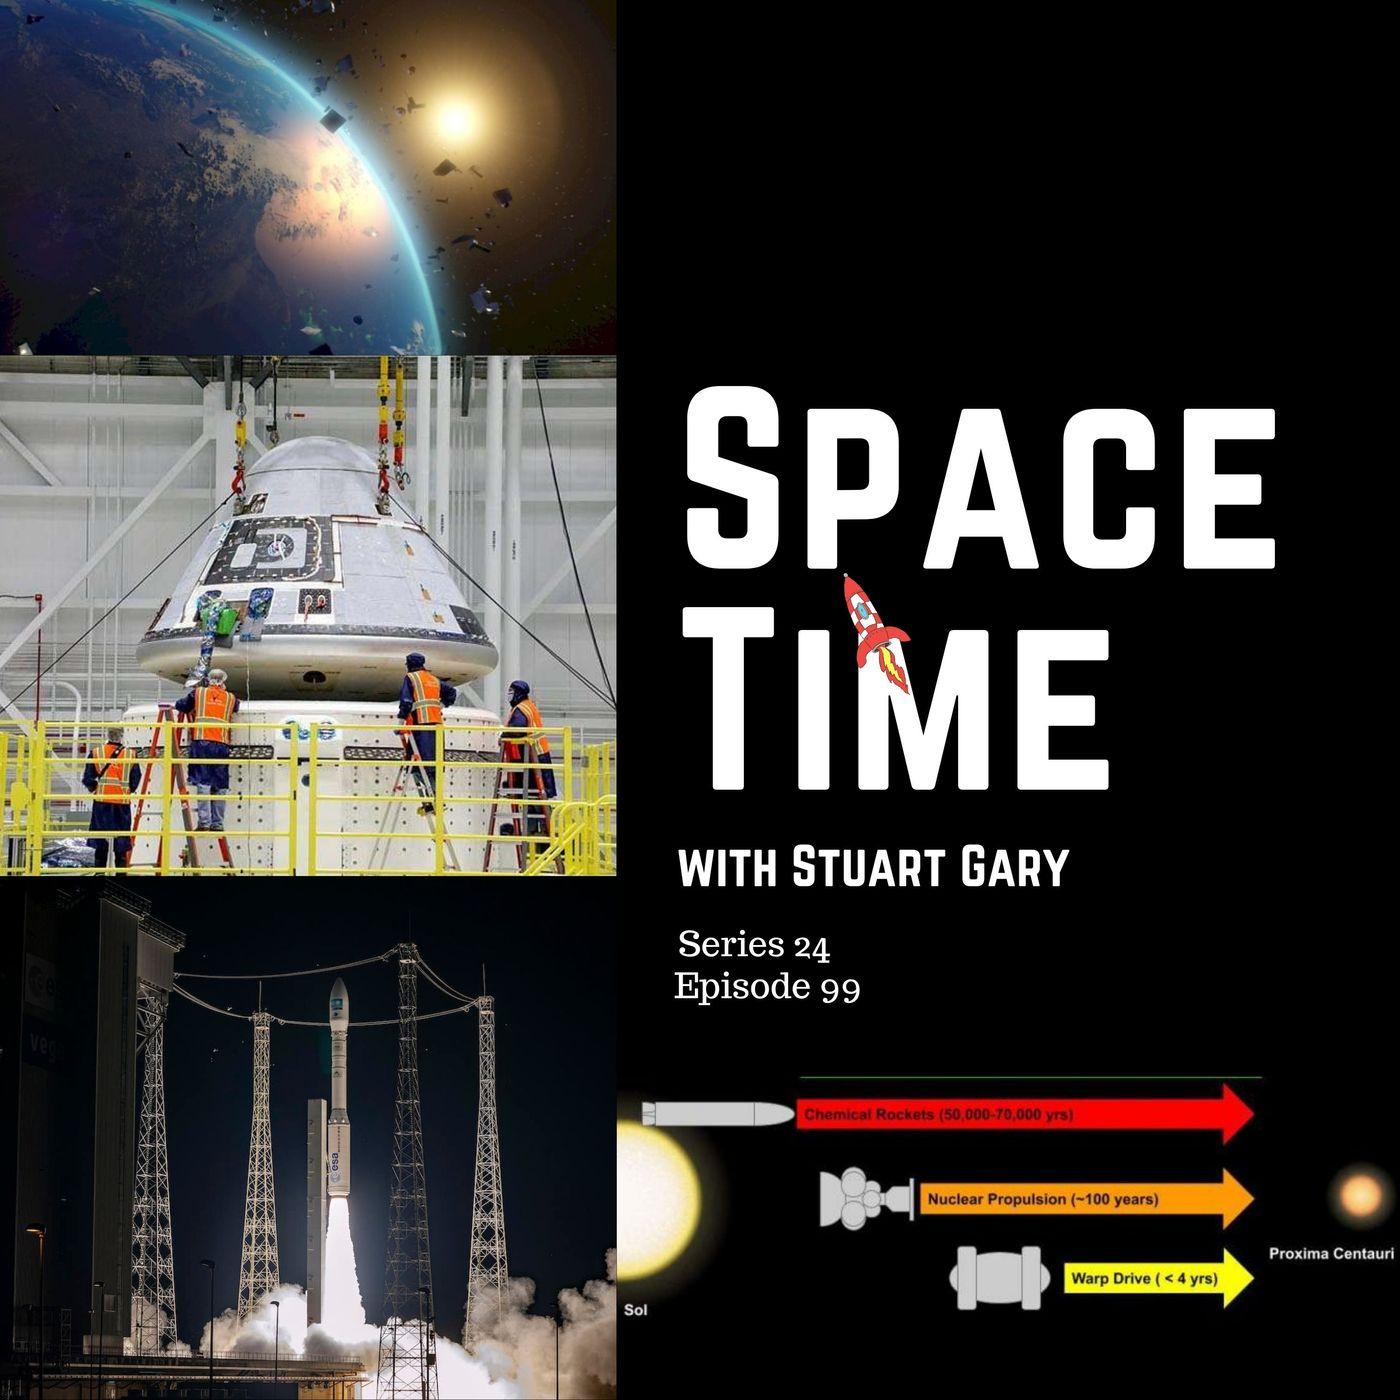 Space Junk Destroys Satellite